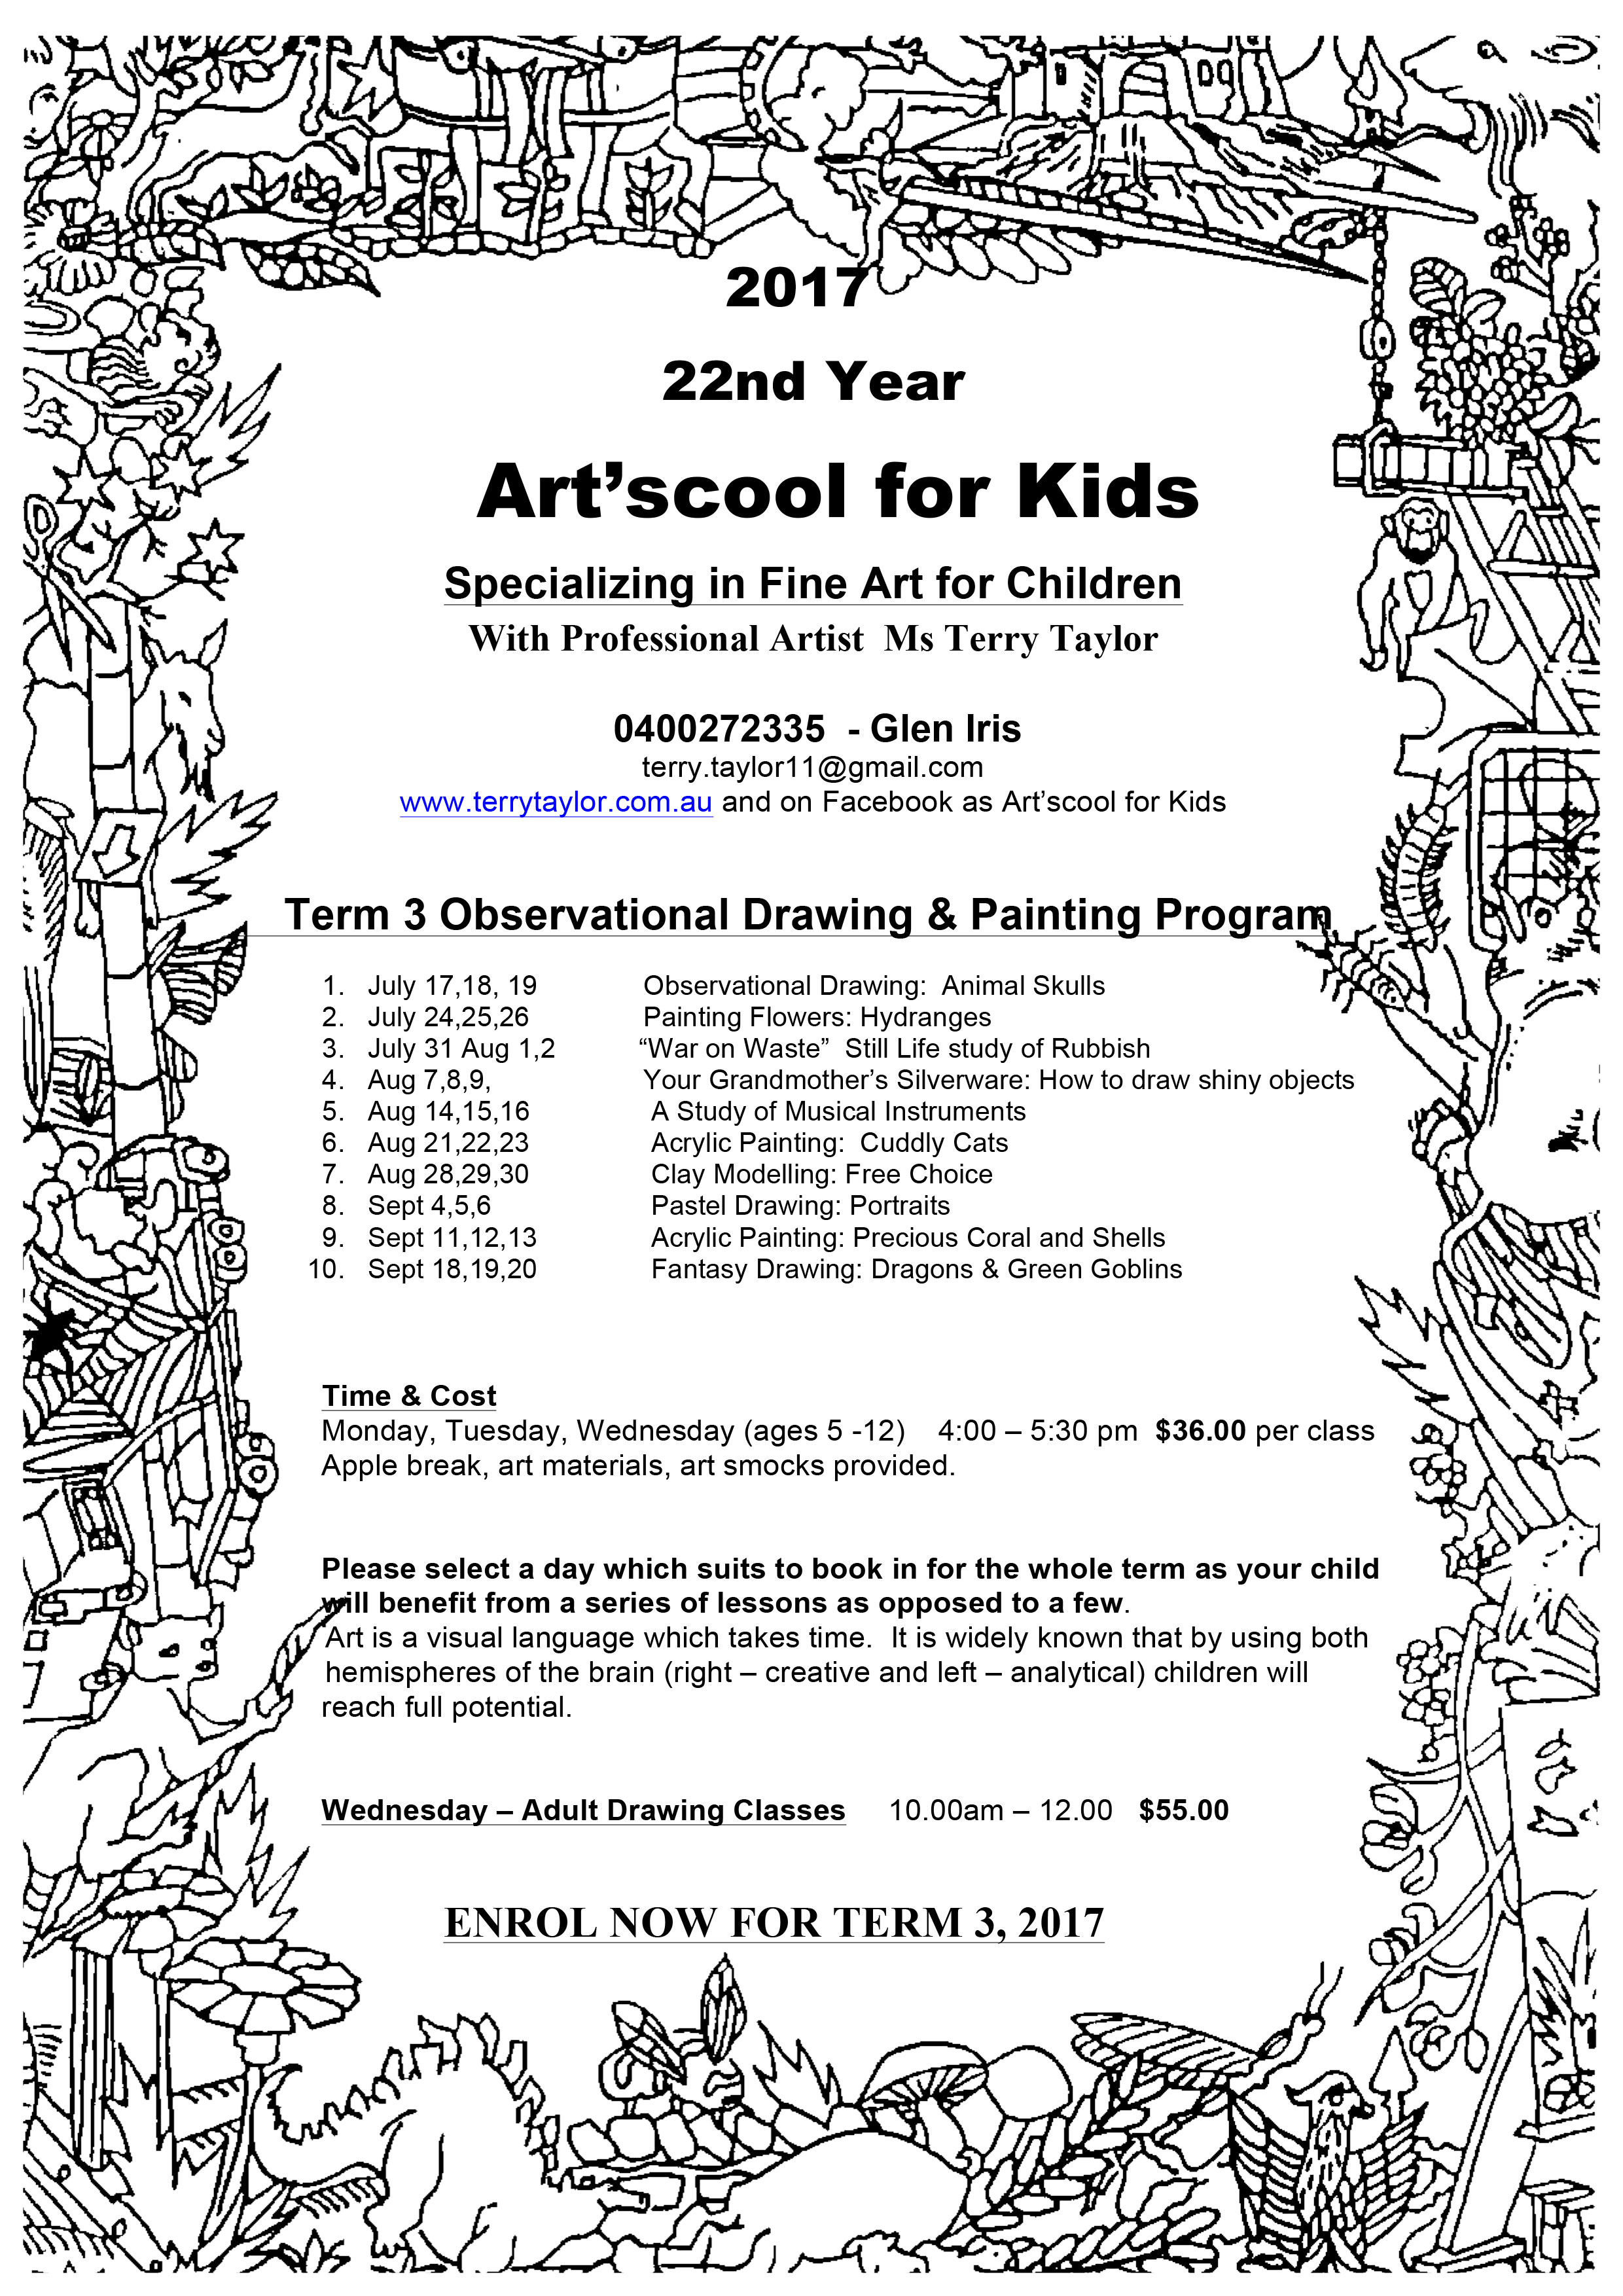 Melbourne artscool for kids term 3 2017 izmirmasajfo